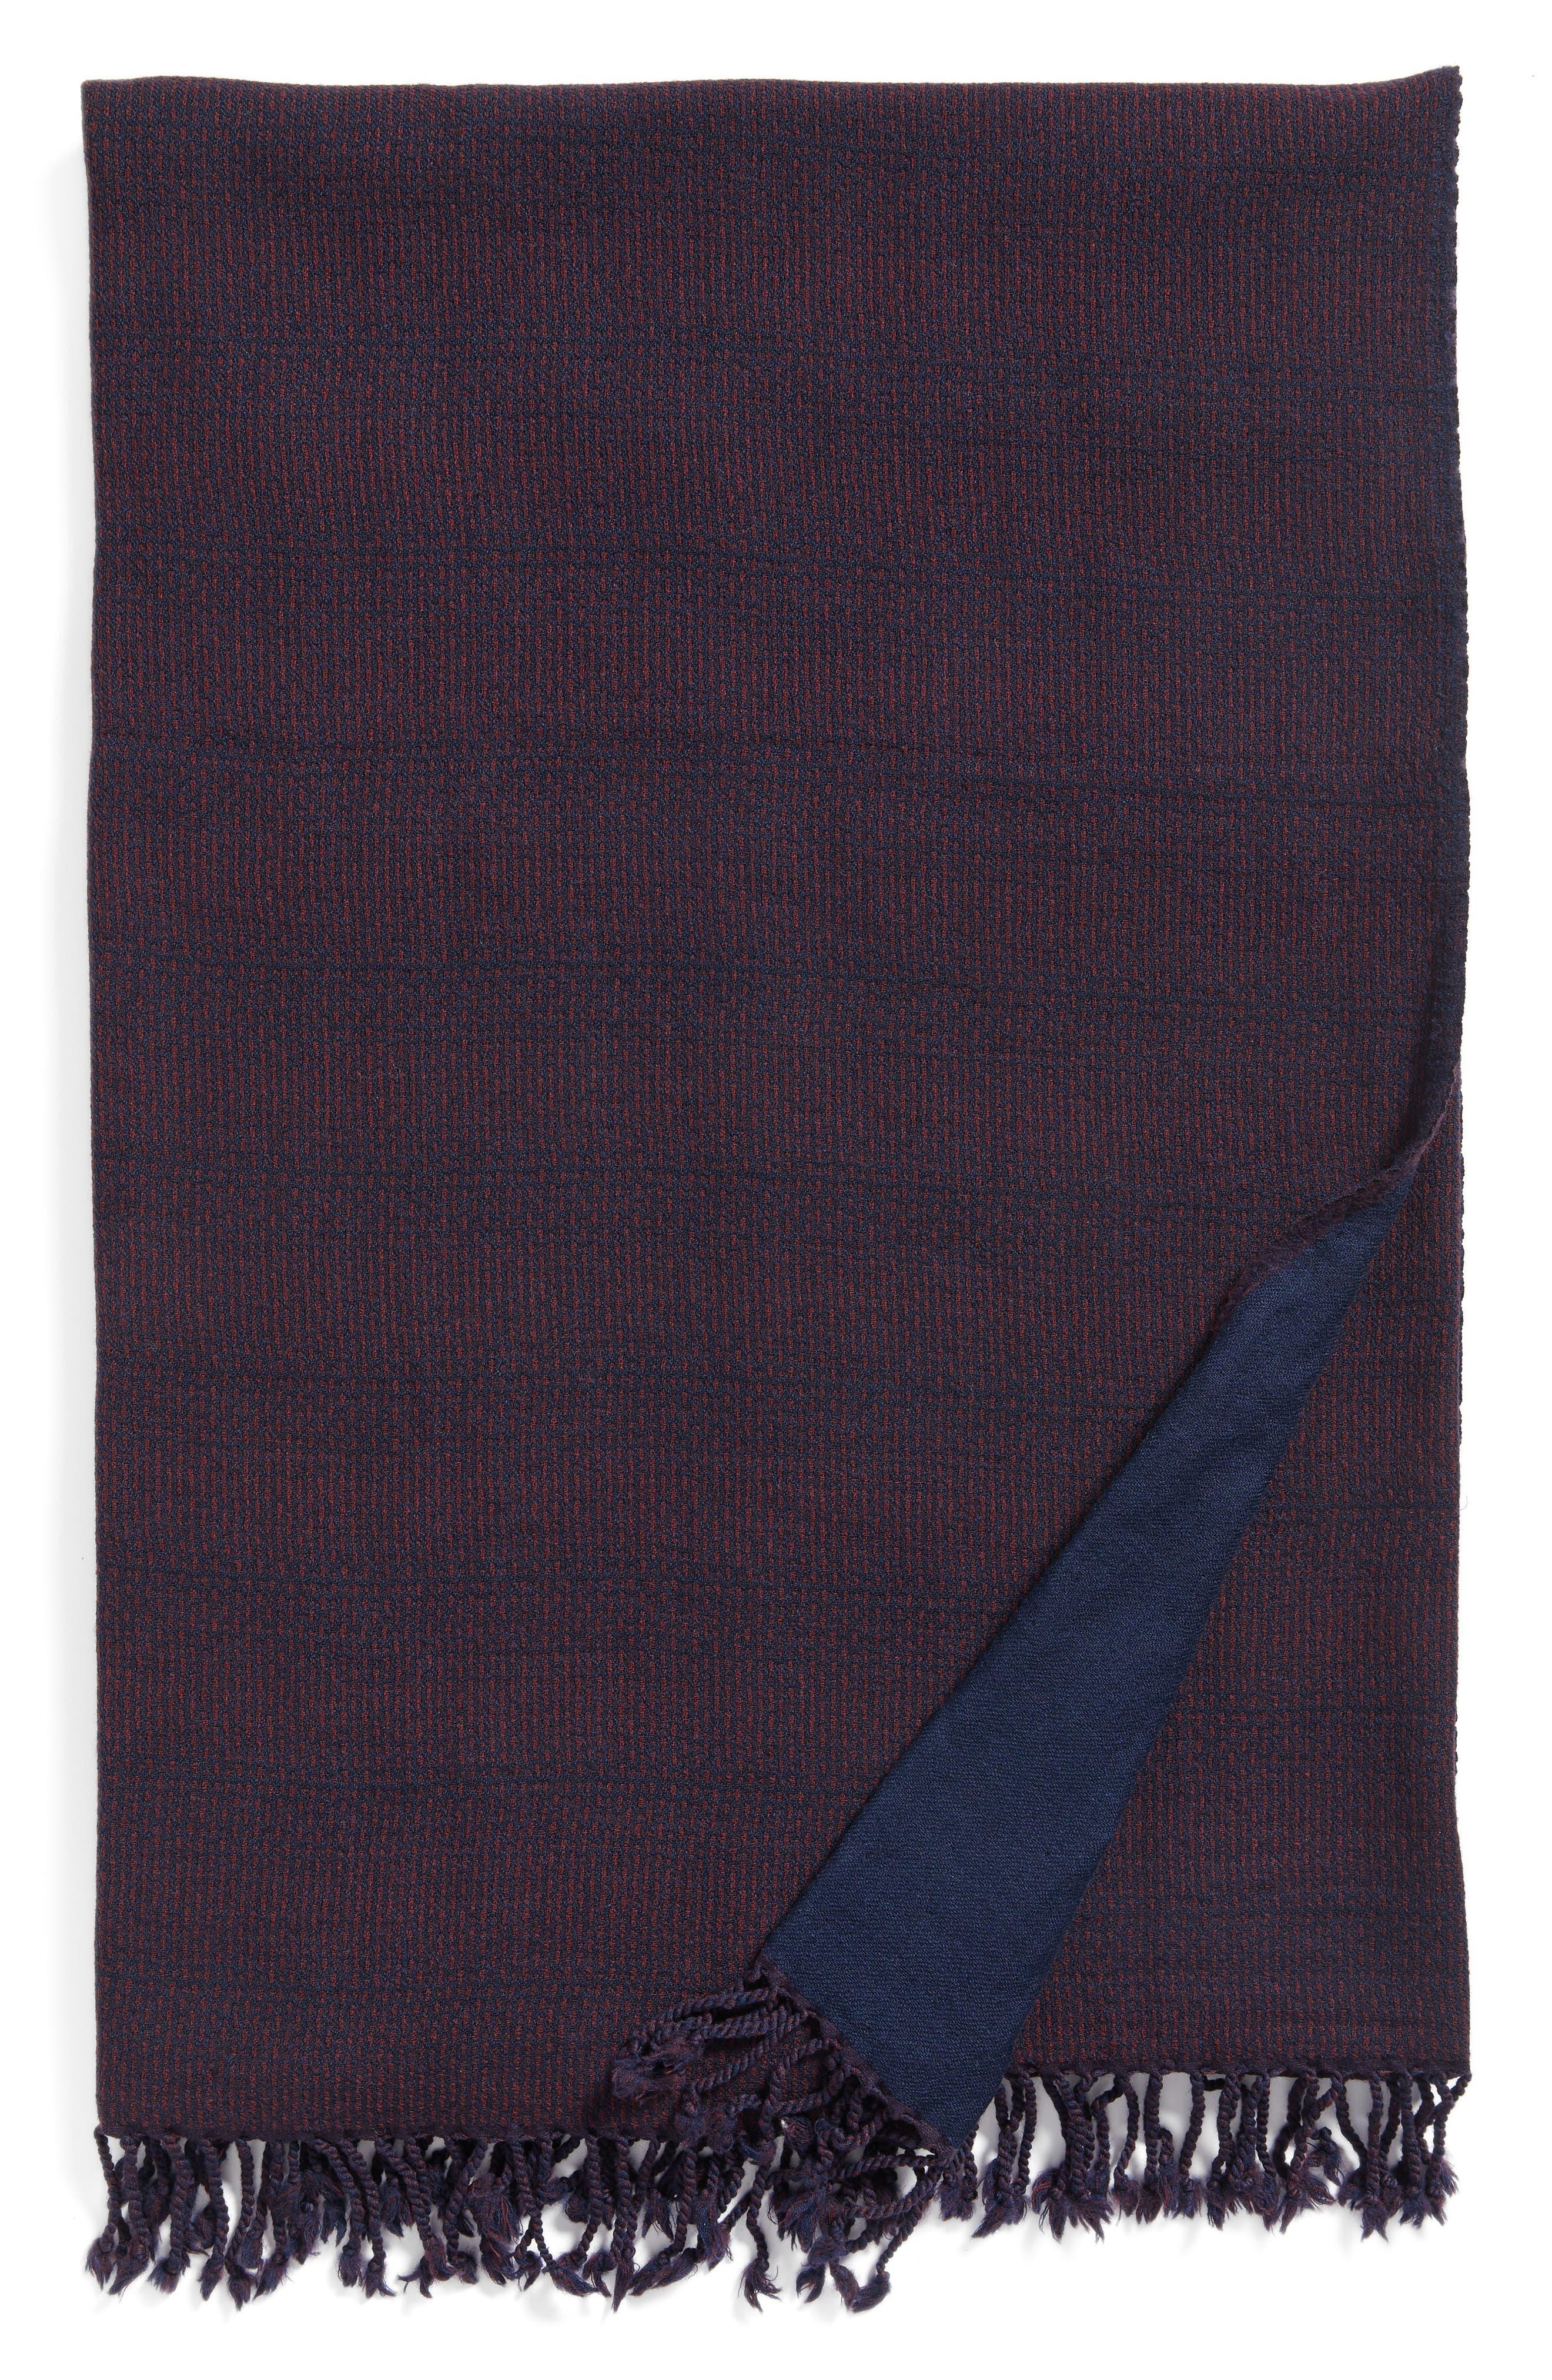 Stipple Stripe Double Face Merino Wool Throw,                         Main,                         color, STIPPLE STRIPE